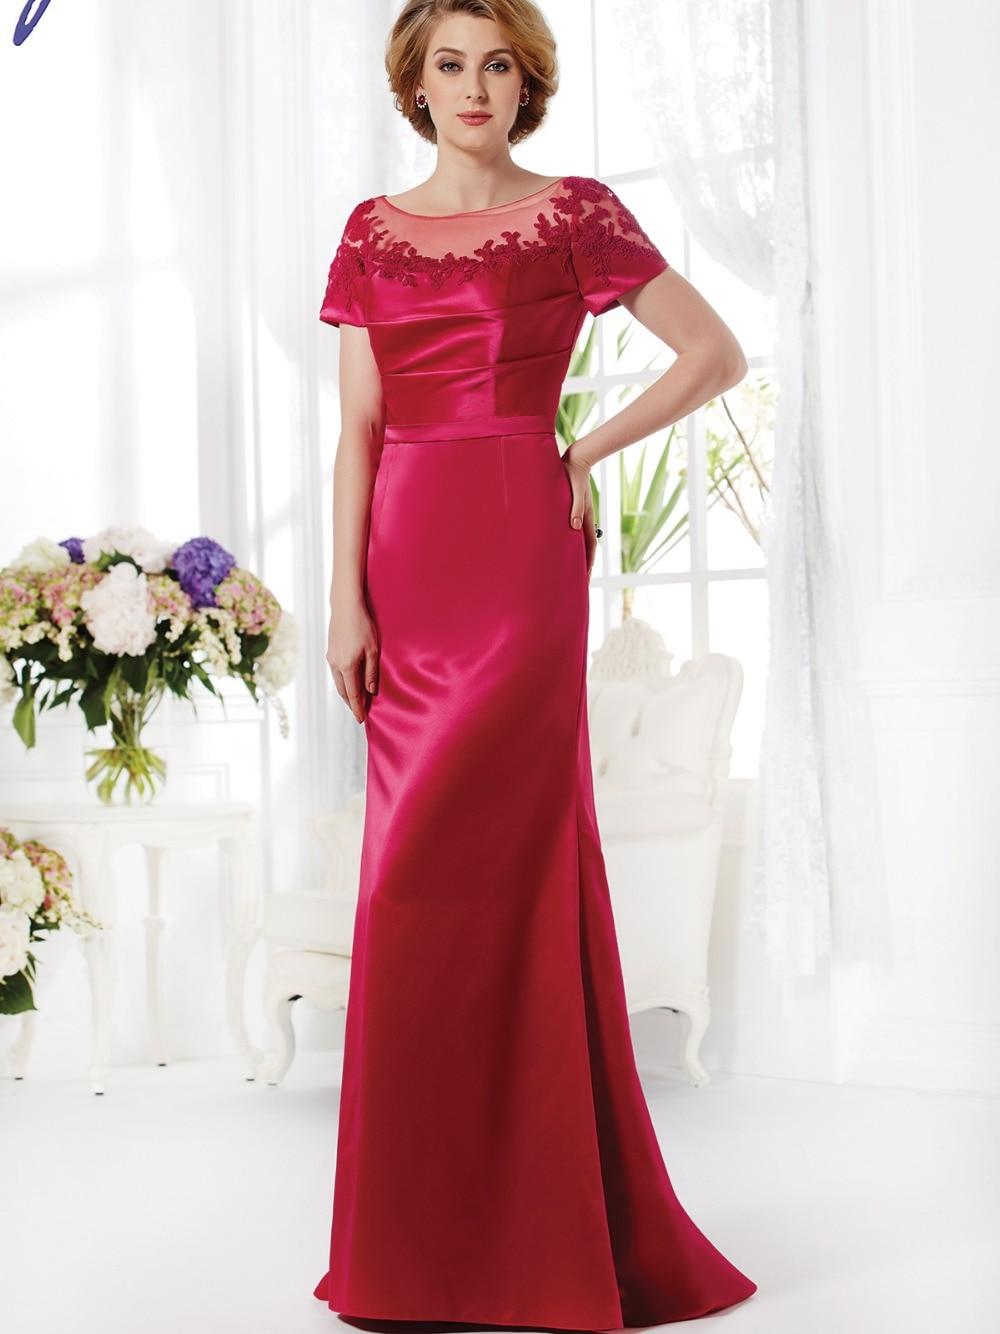 Elegant Long Red Mother Of The Bride Dresses Short Sleeves Illusion Neckline Floor Length Evening Formal Gown For Women XMD107